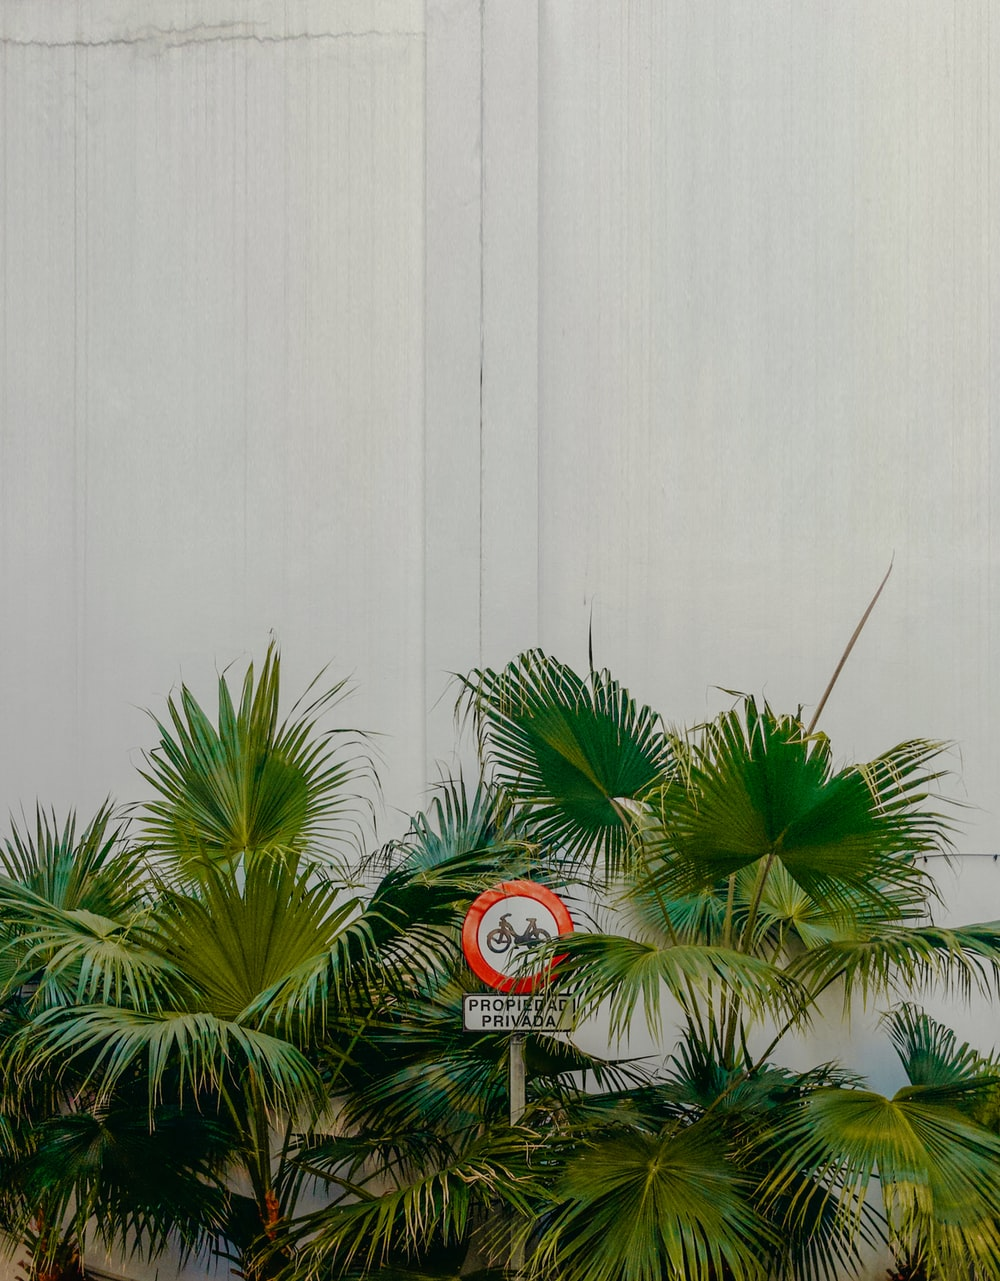 green palm tree beside white wall